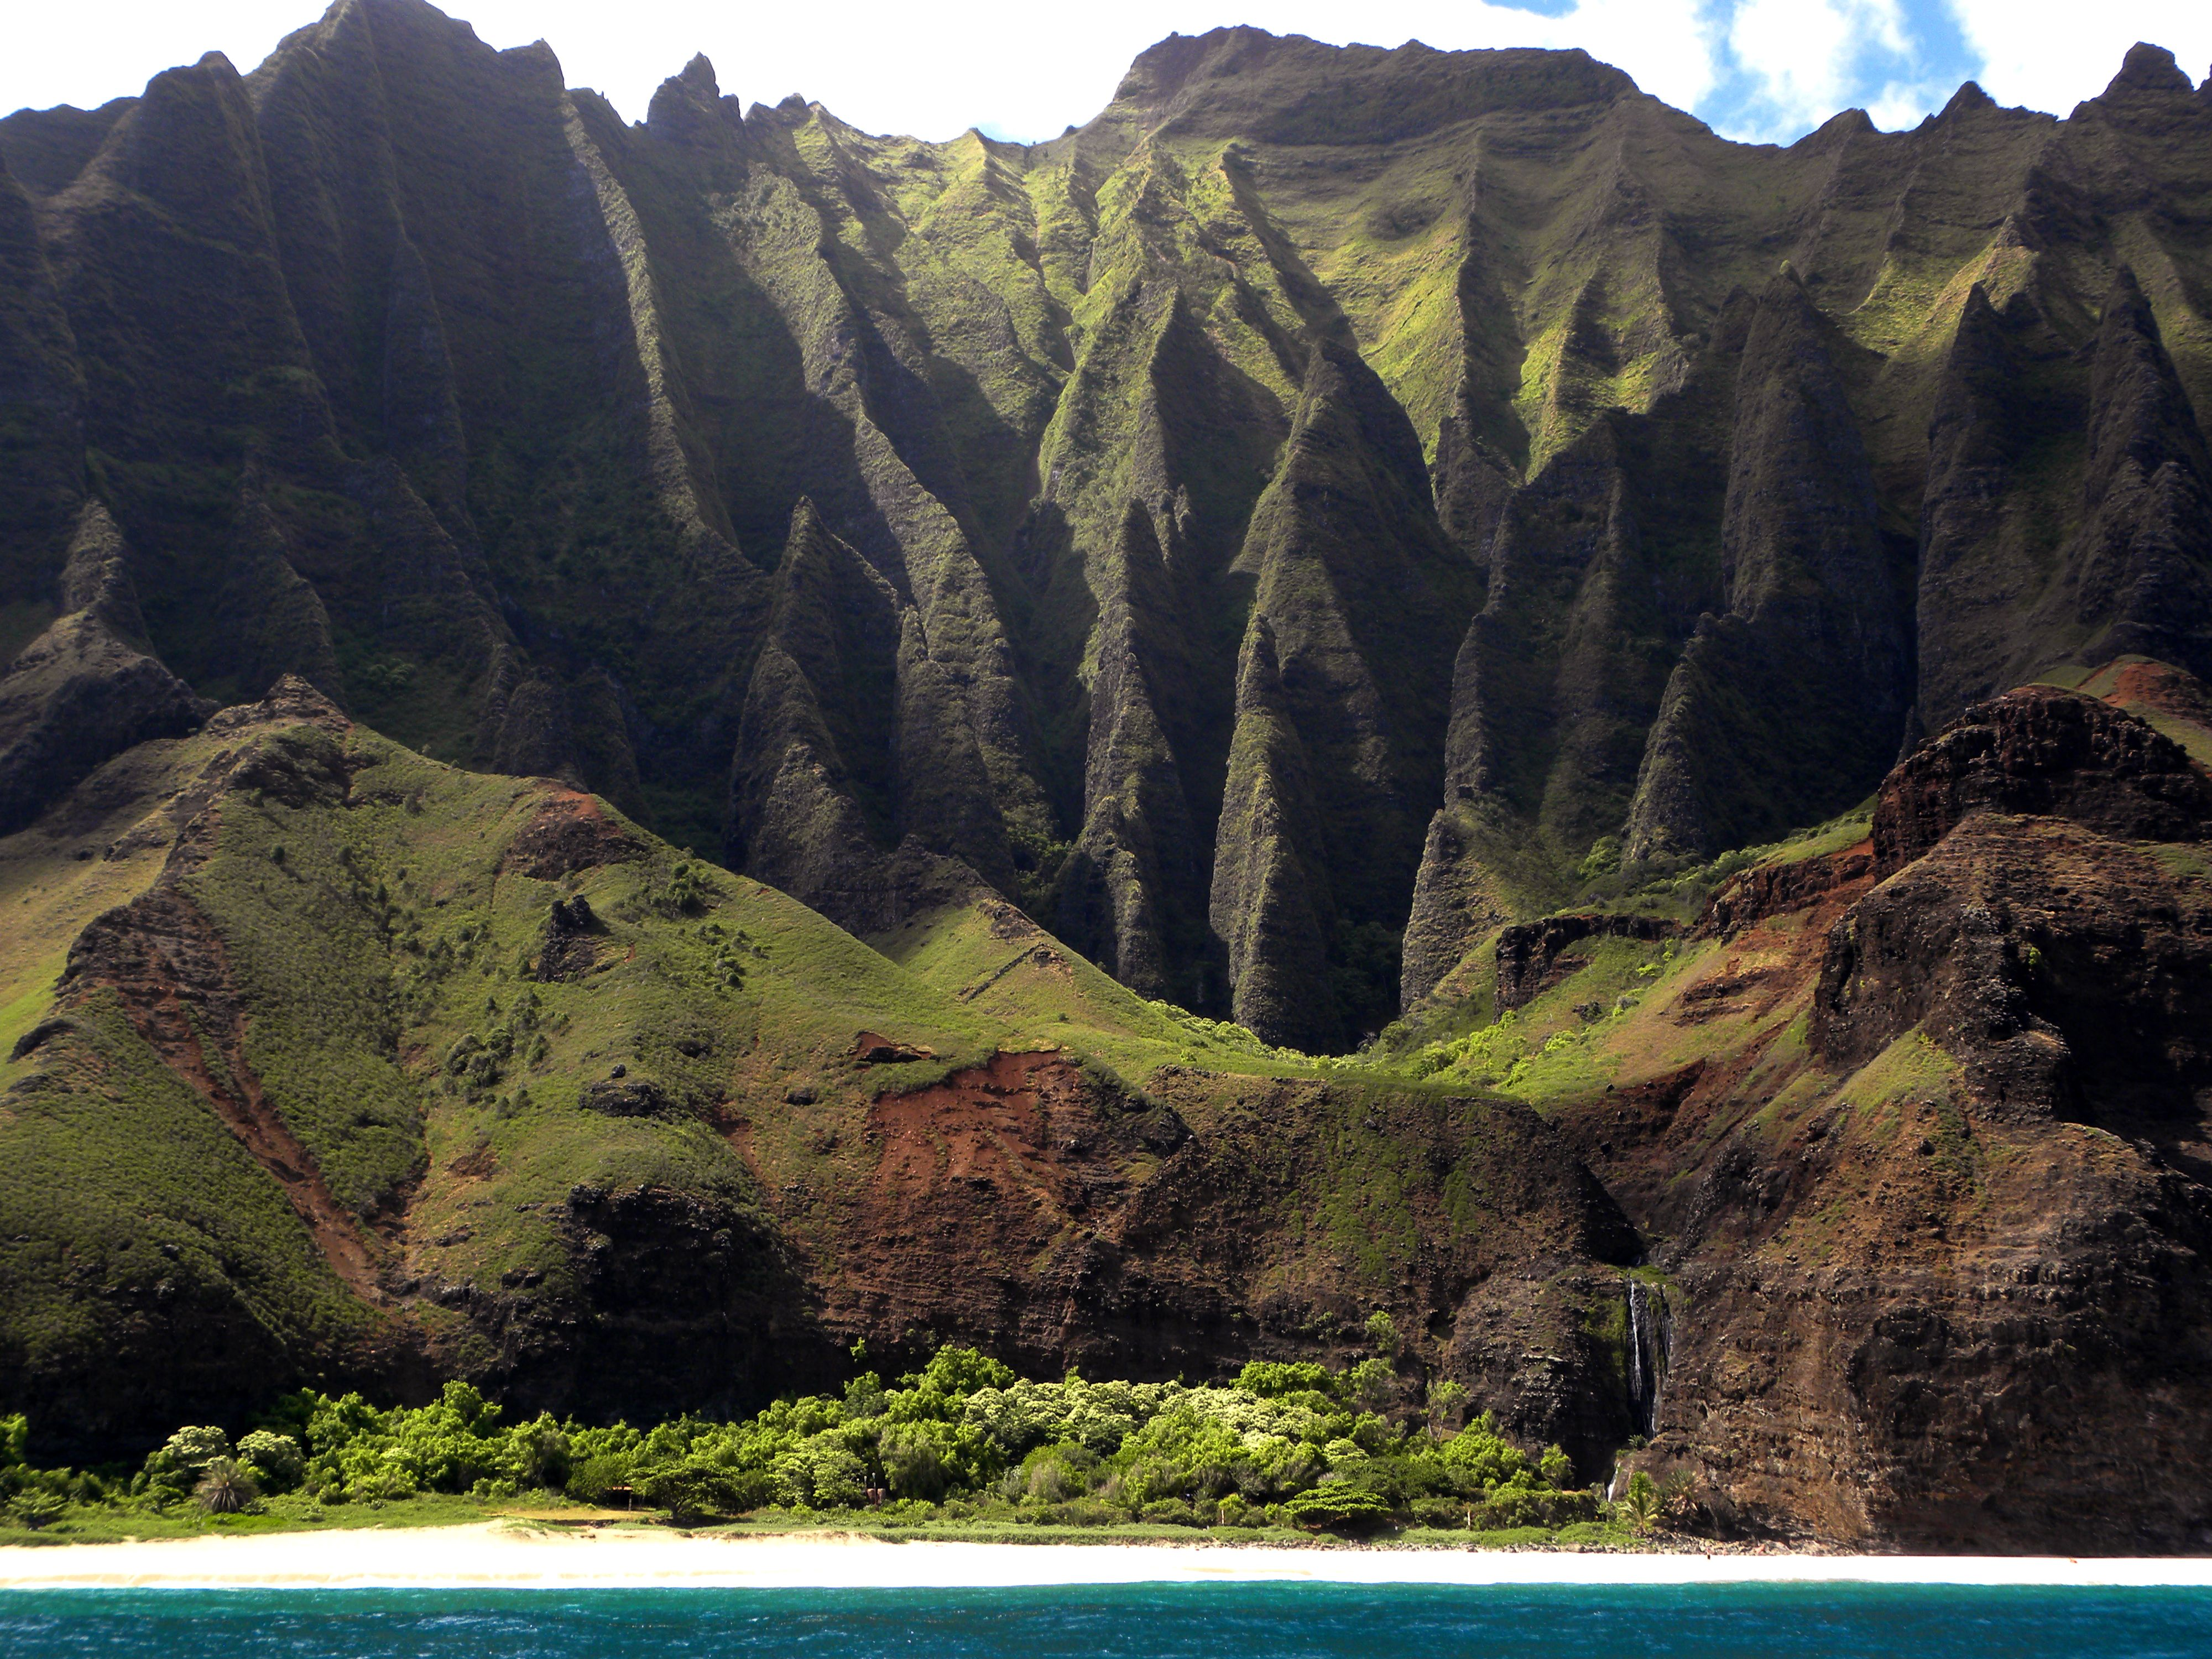 Nature's own carved cathedrals Napoli Coast, Kauai